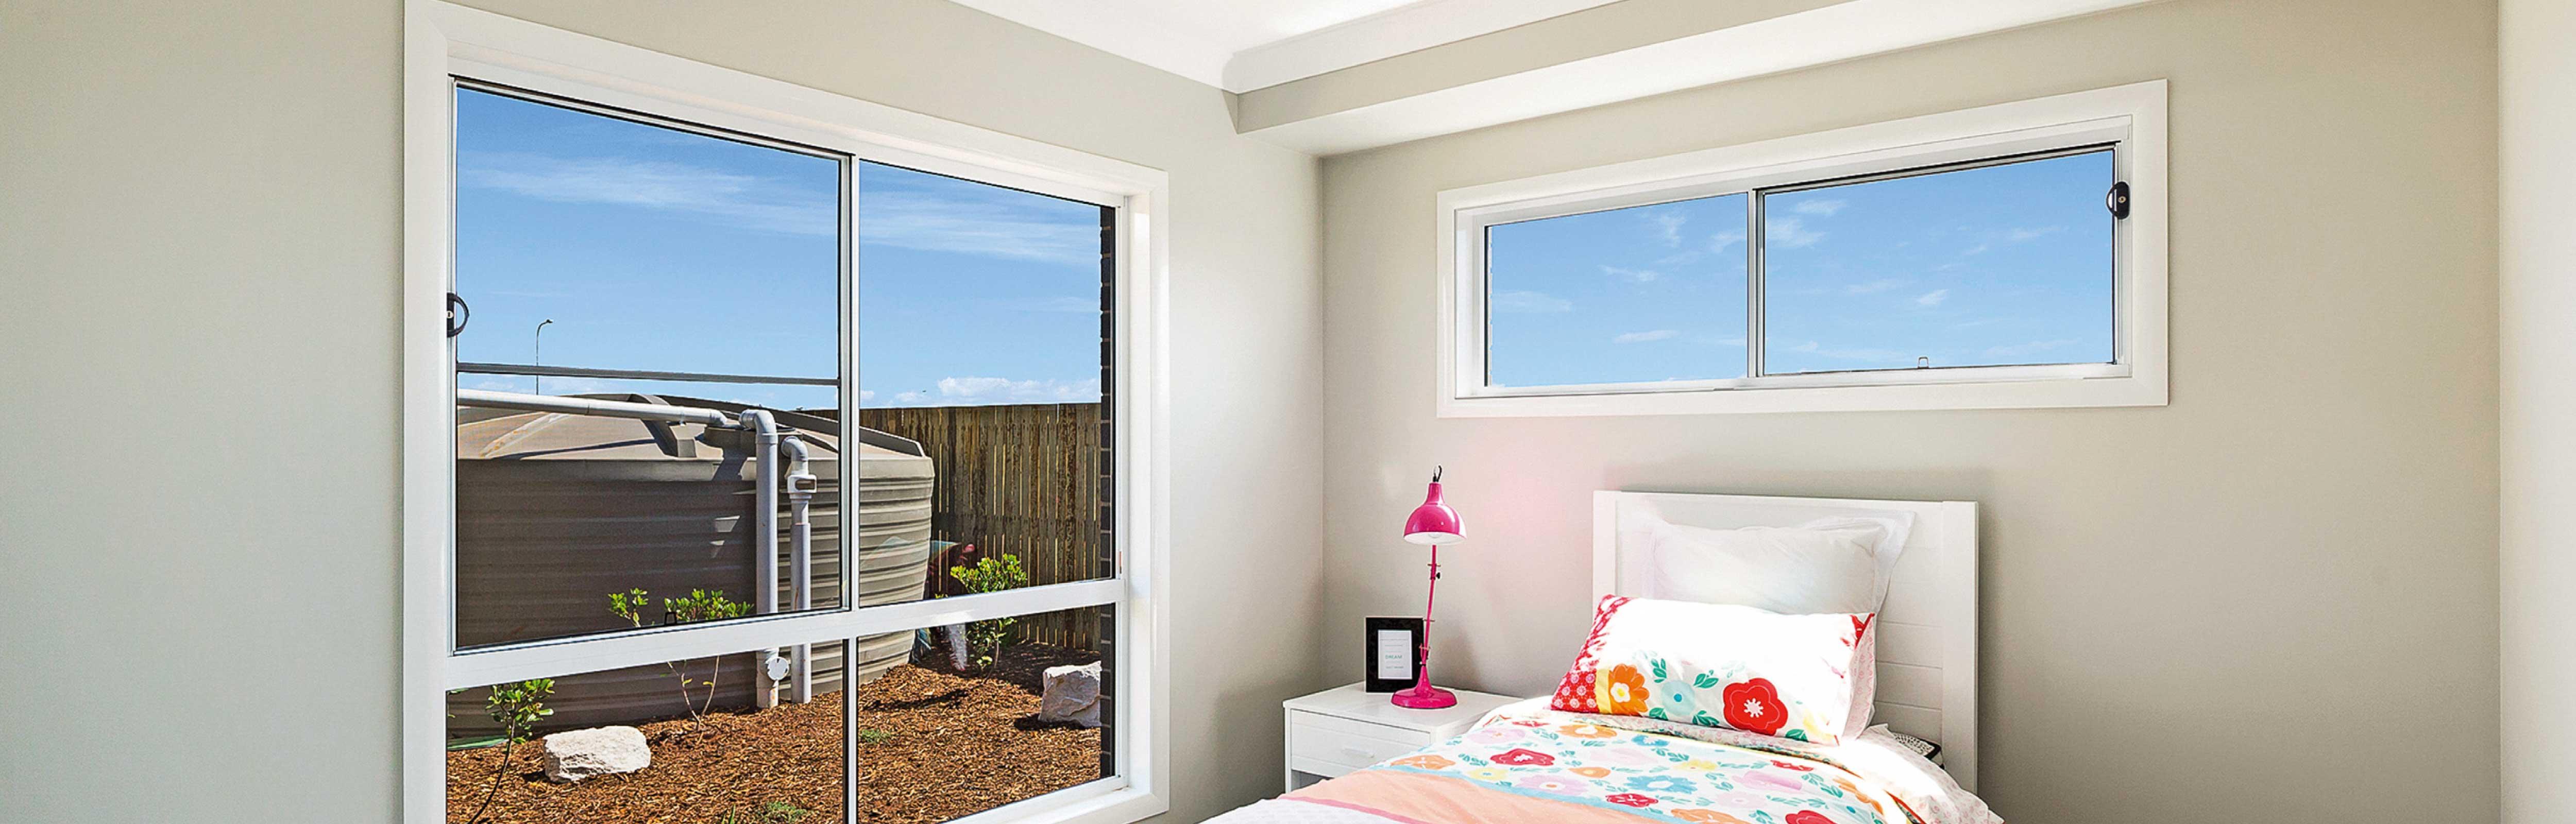 Two White Aluminium Sliding Windows